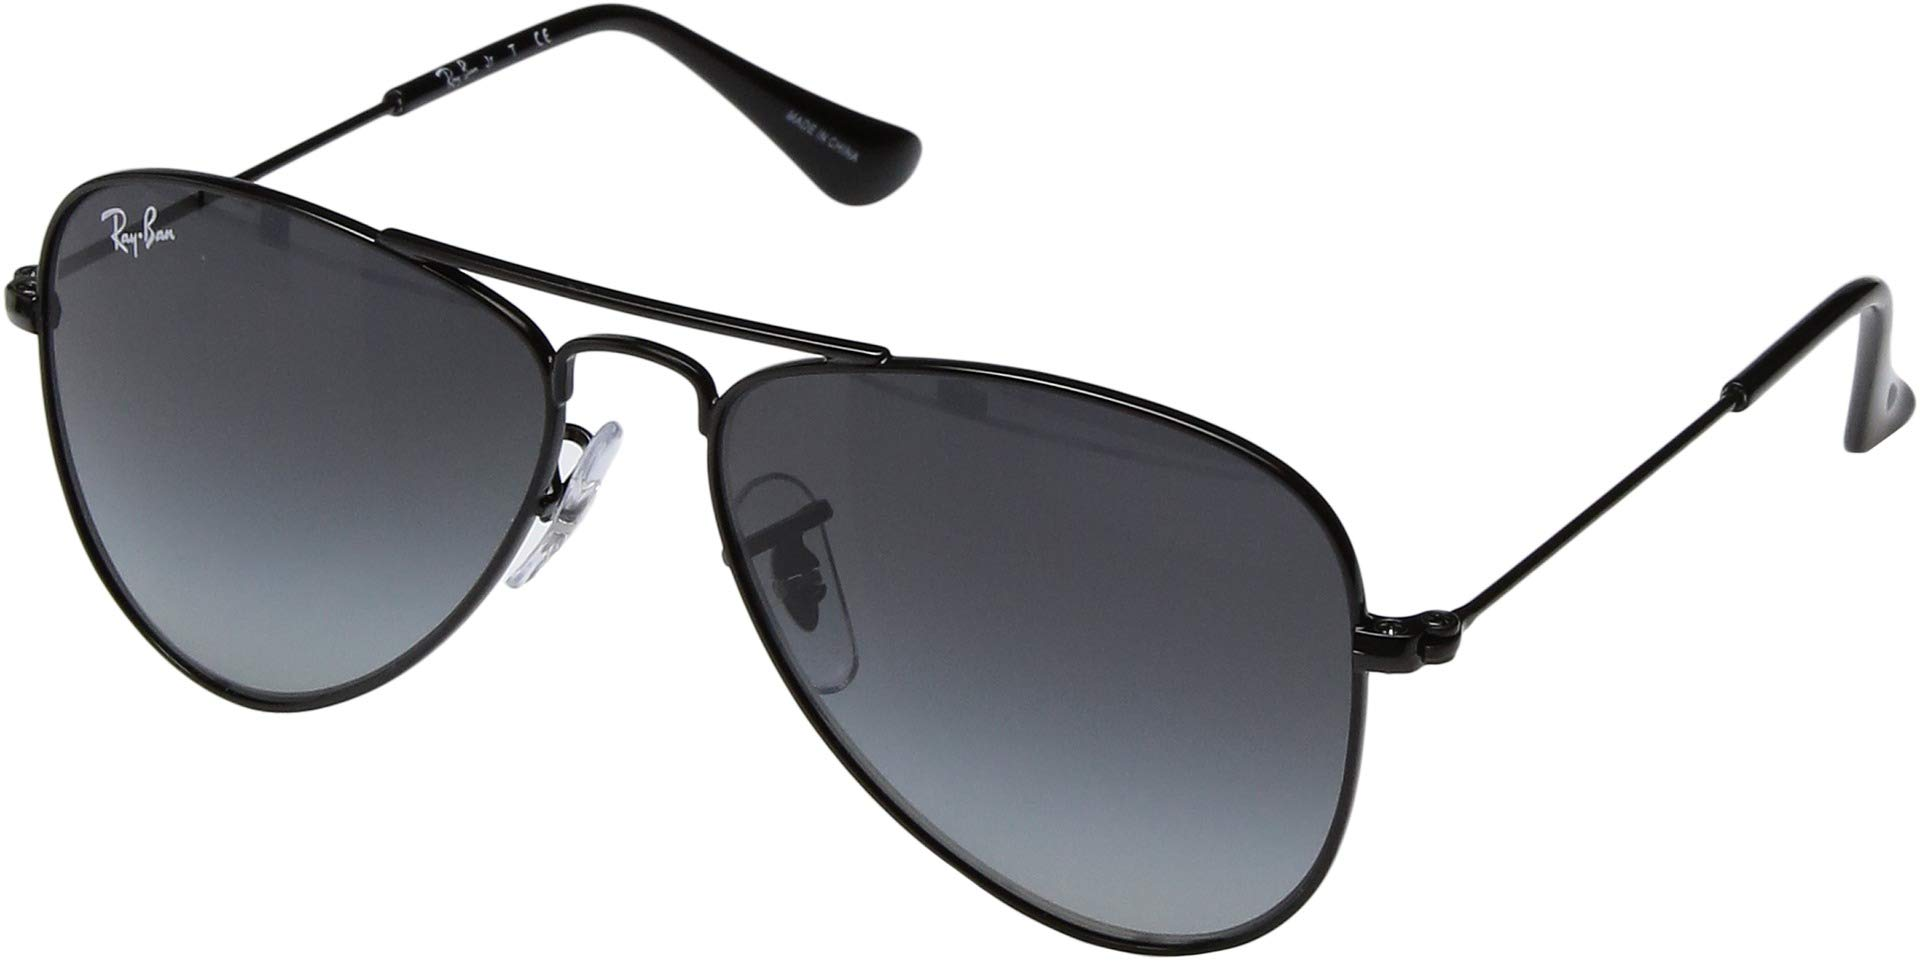 RAY-BAN JUNIOR Kids' RJ9506S Aviator Kids Sunglasses, Shiny Black/Grey Gradient, 50 mm by RAY-BAN JUNIOR